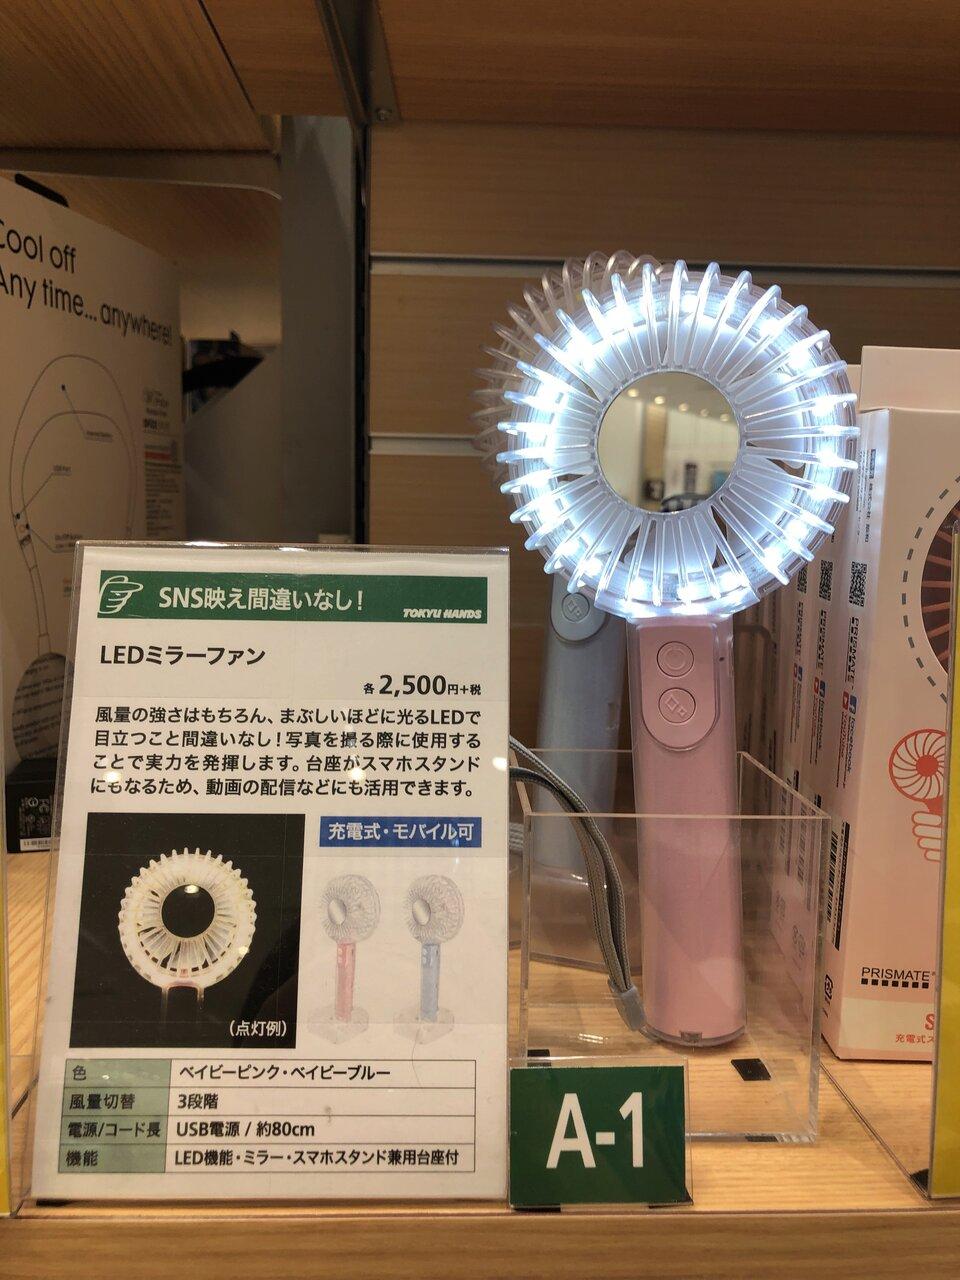 LEDミラーファン:2500円(税別・サンタン)